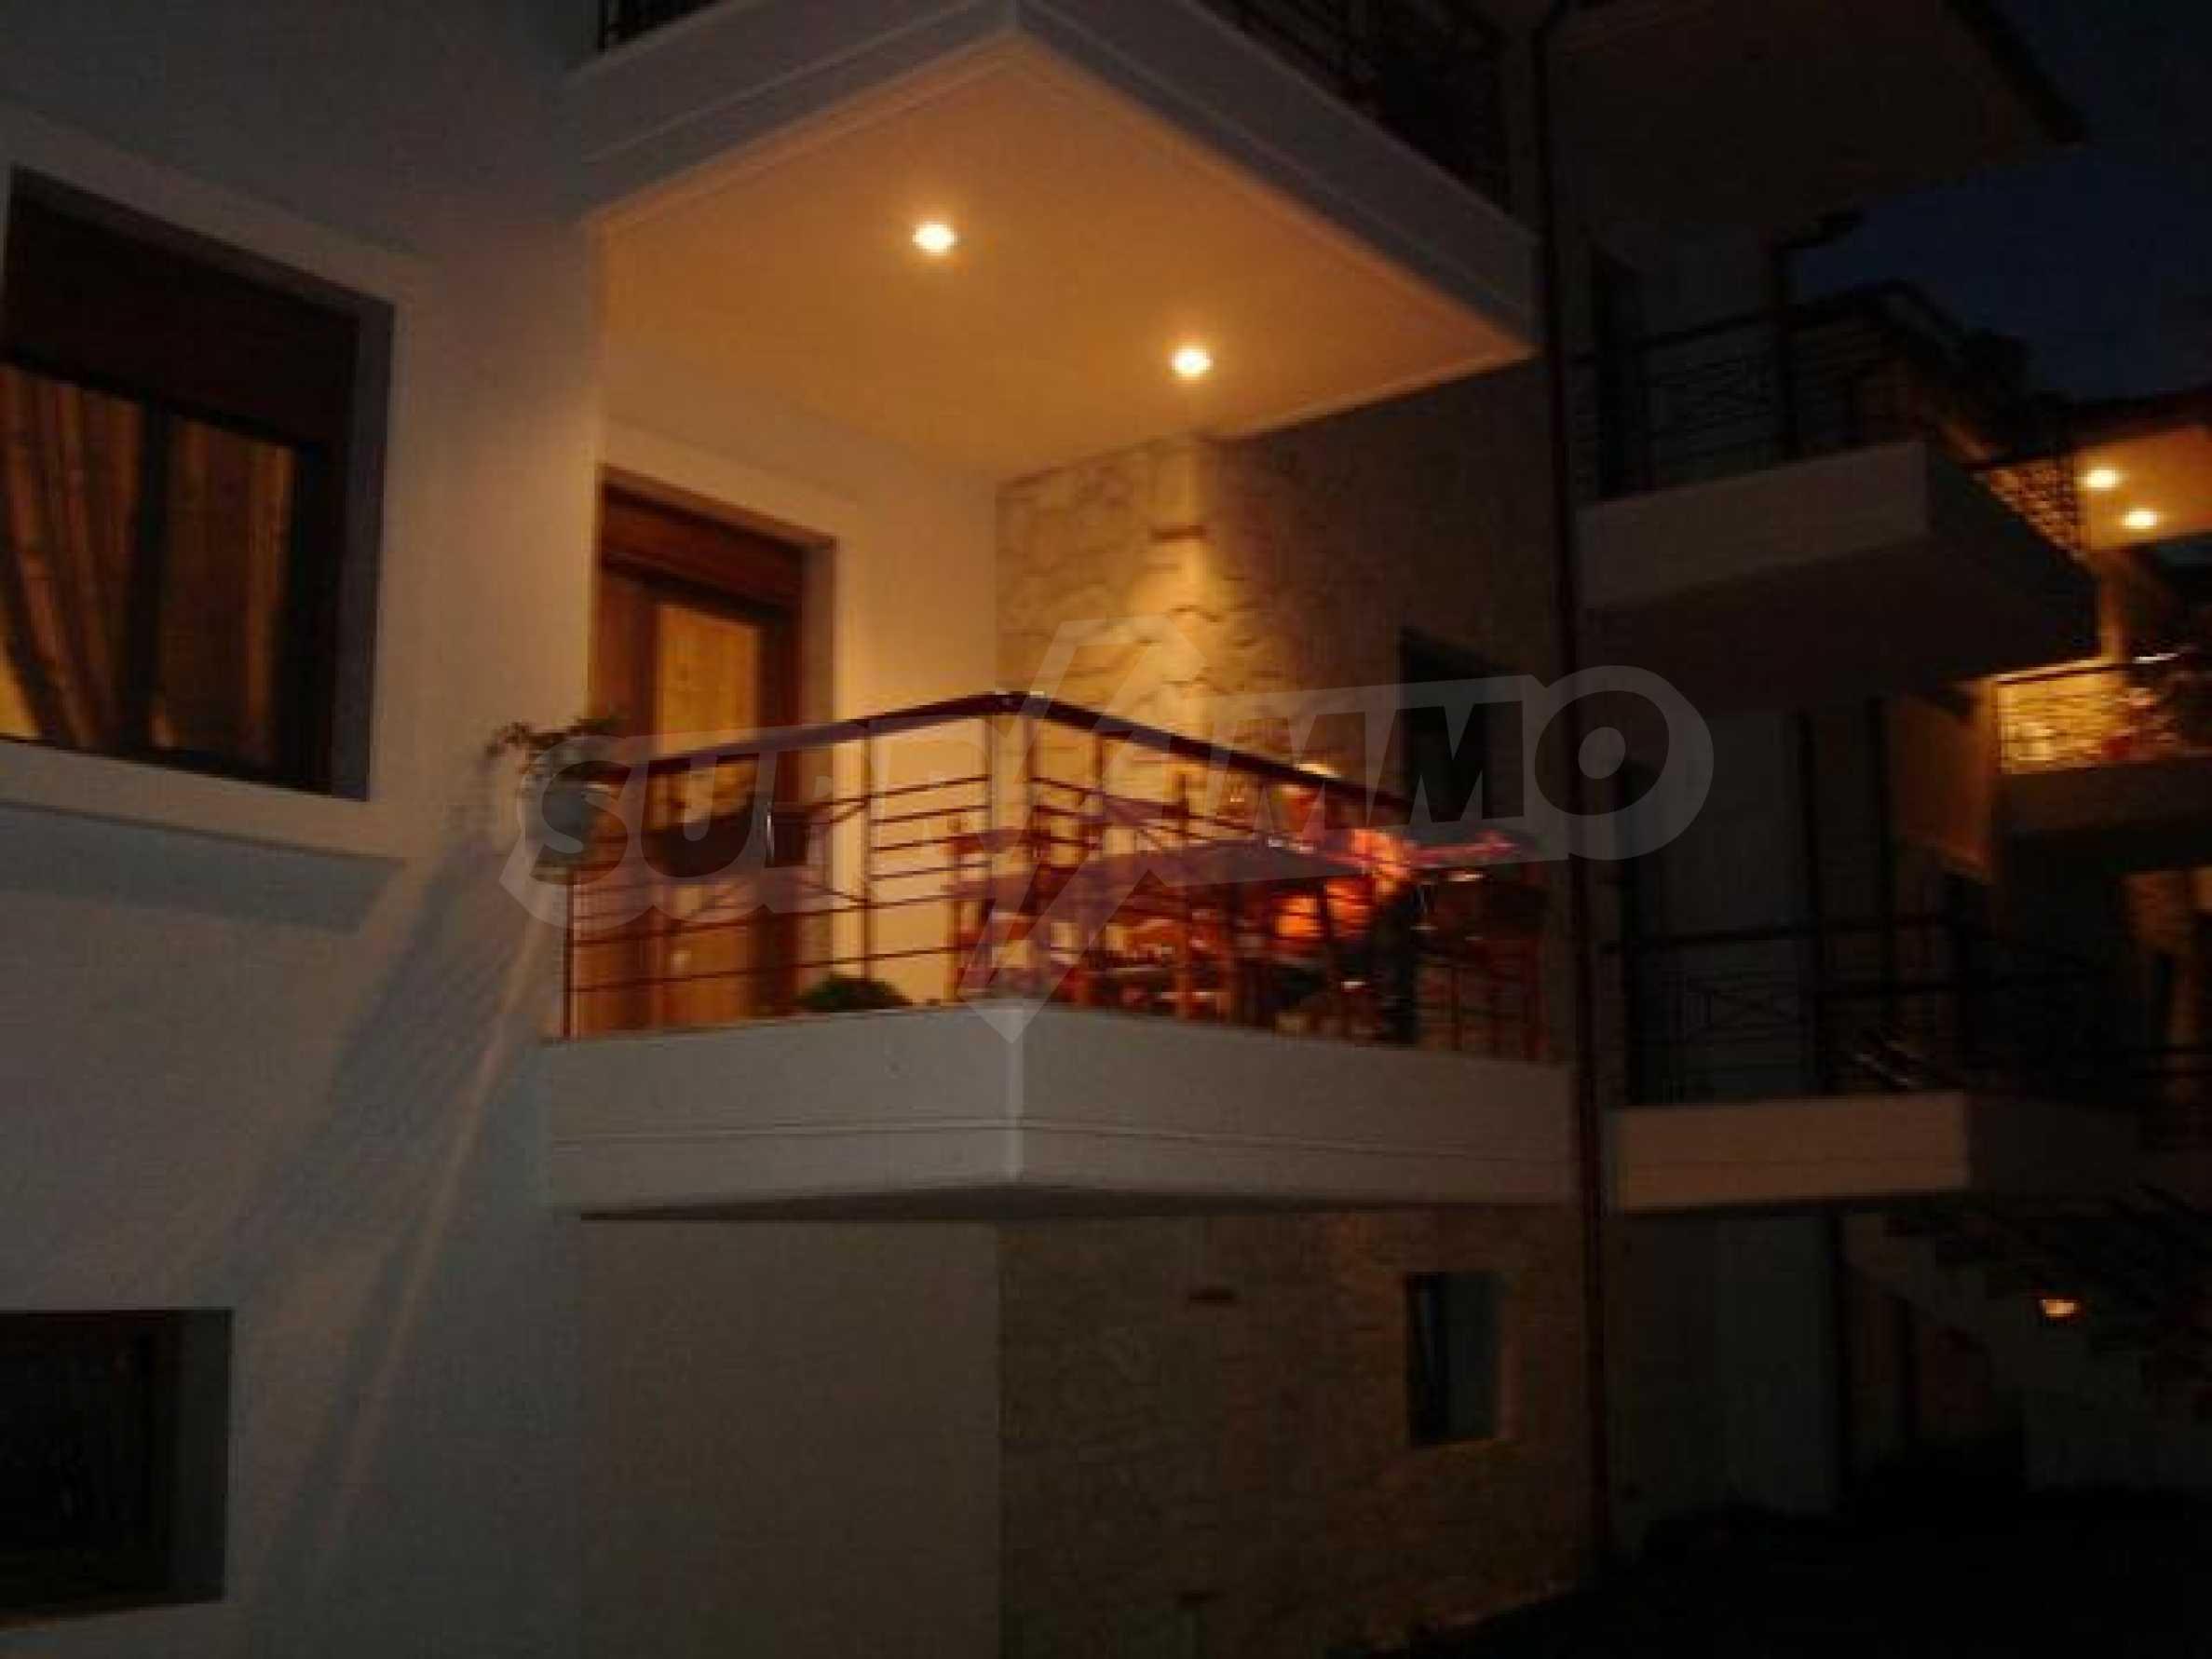 Двустаен апартамент в Афитос, Халкидики 1